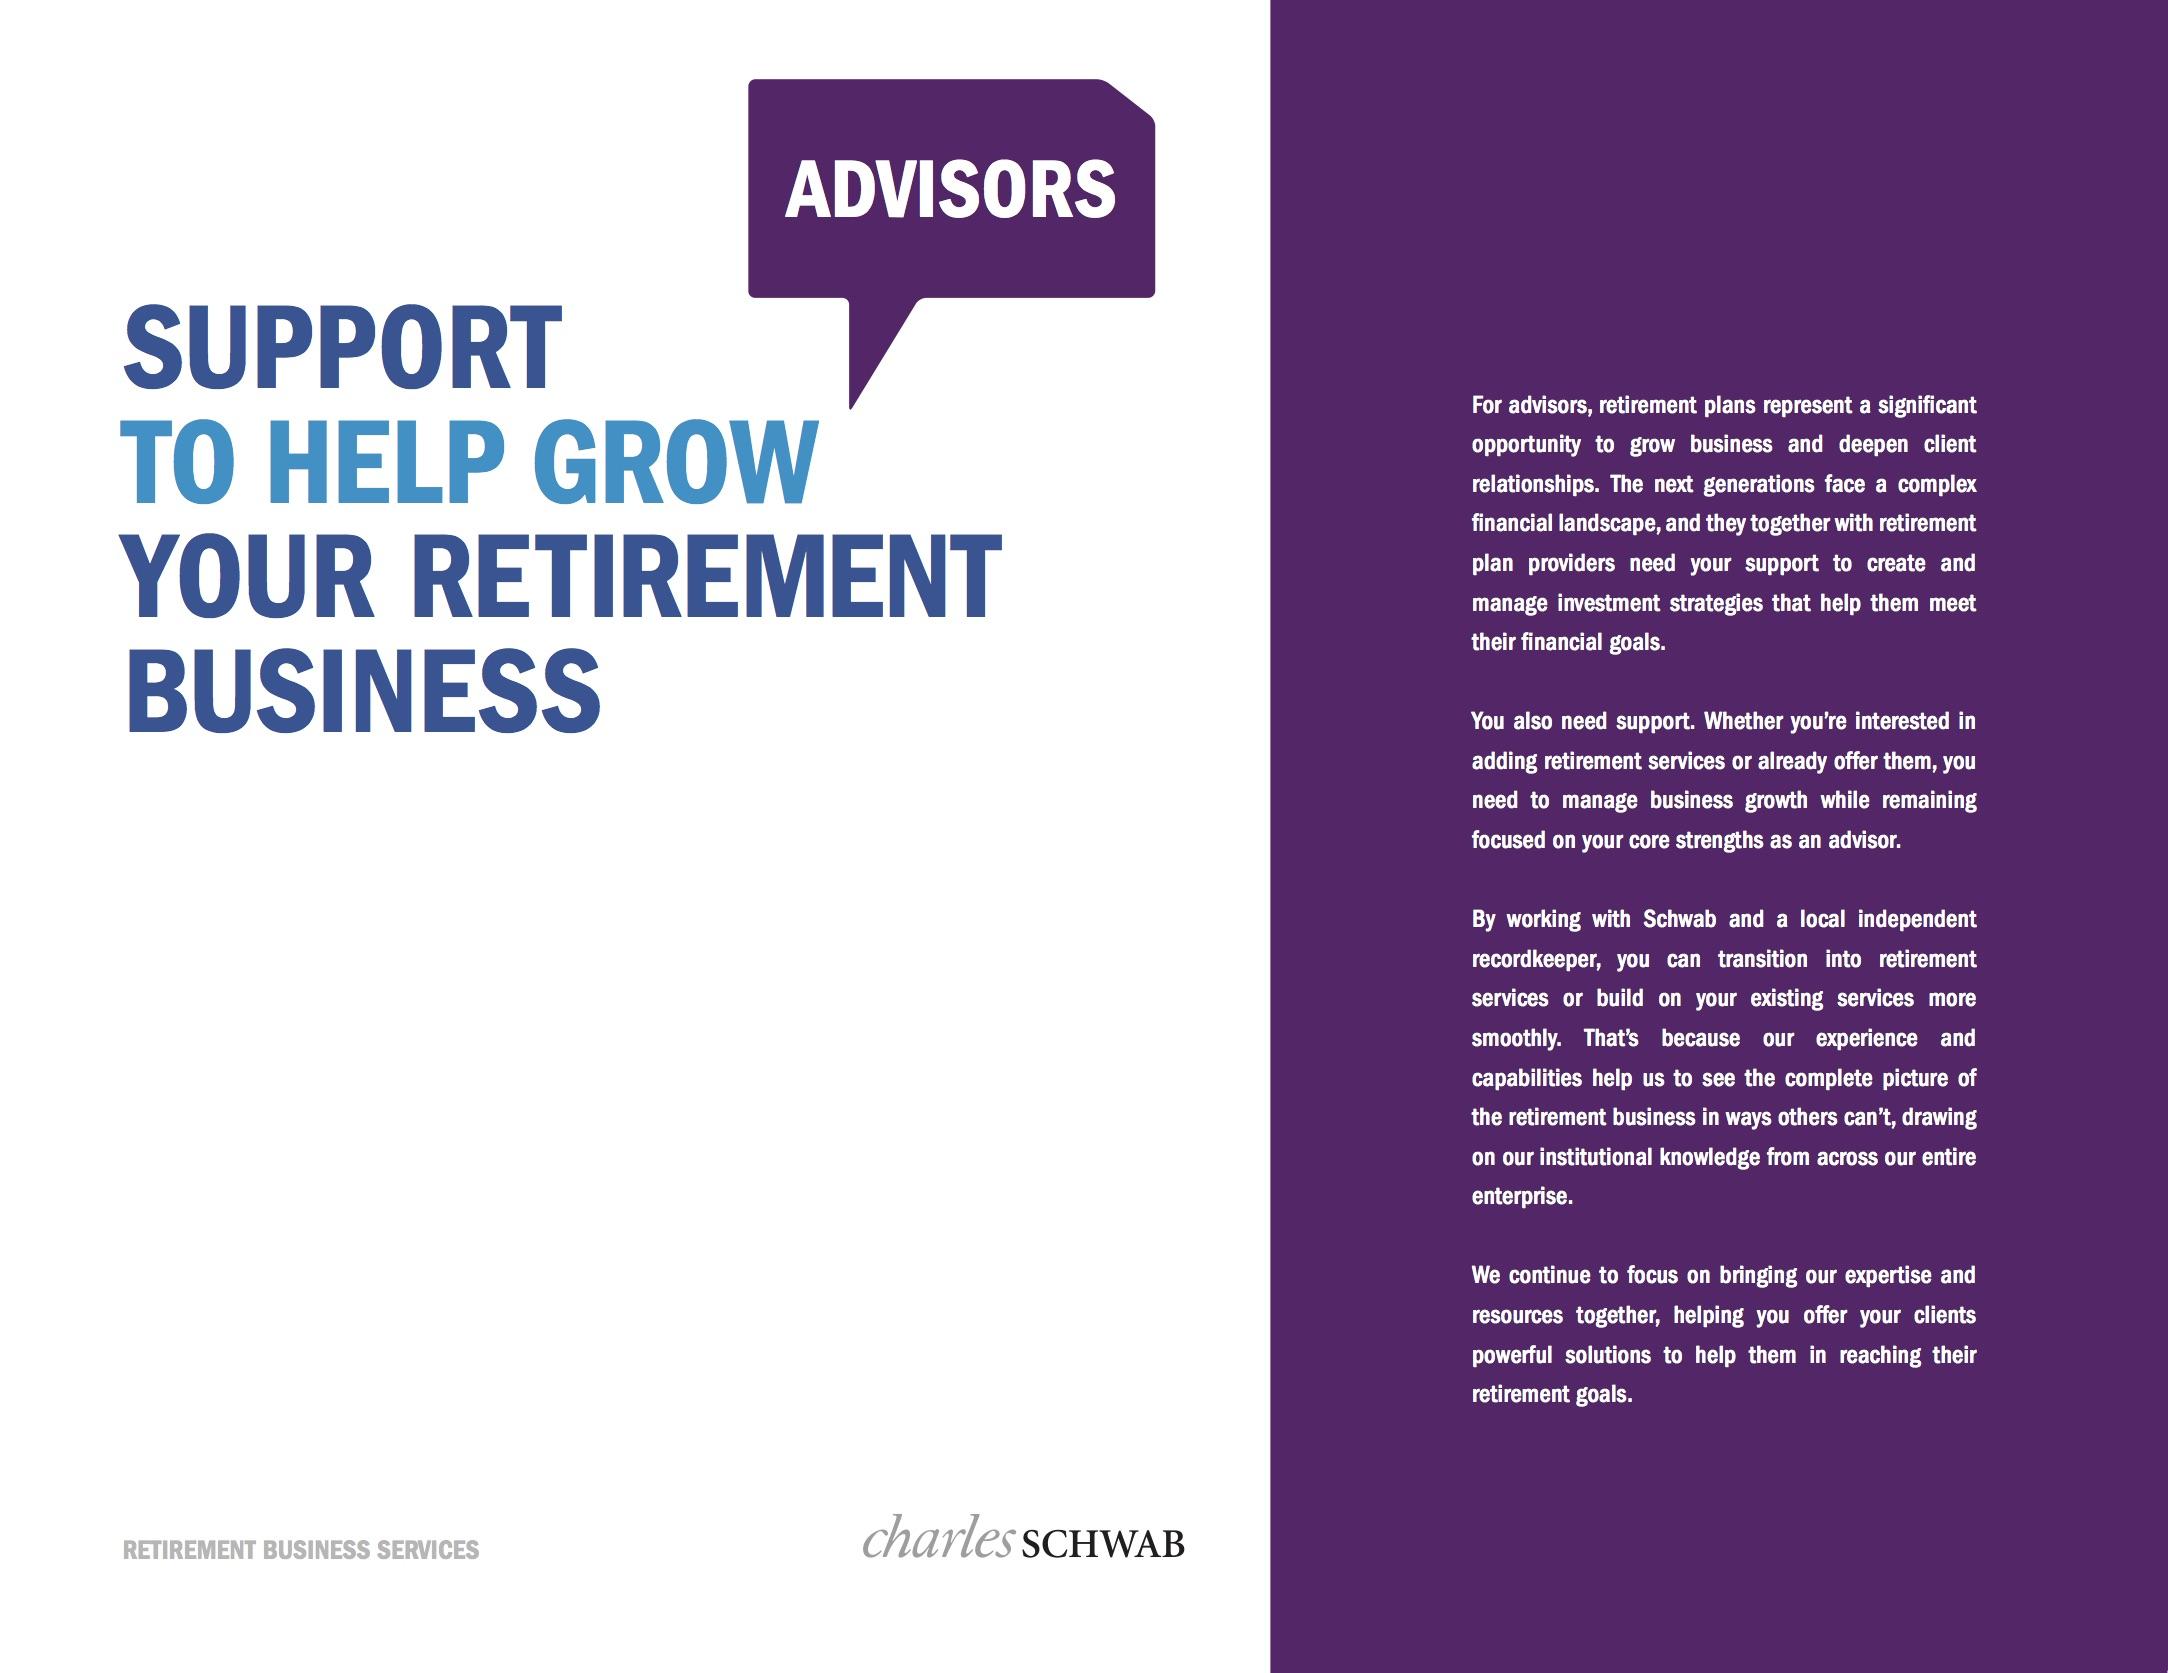 RBS_Advisor_Brochure_PRINT.jpg